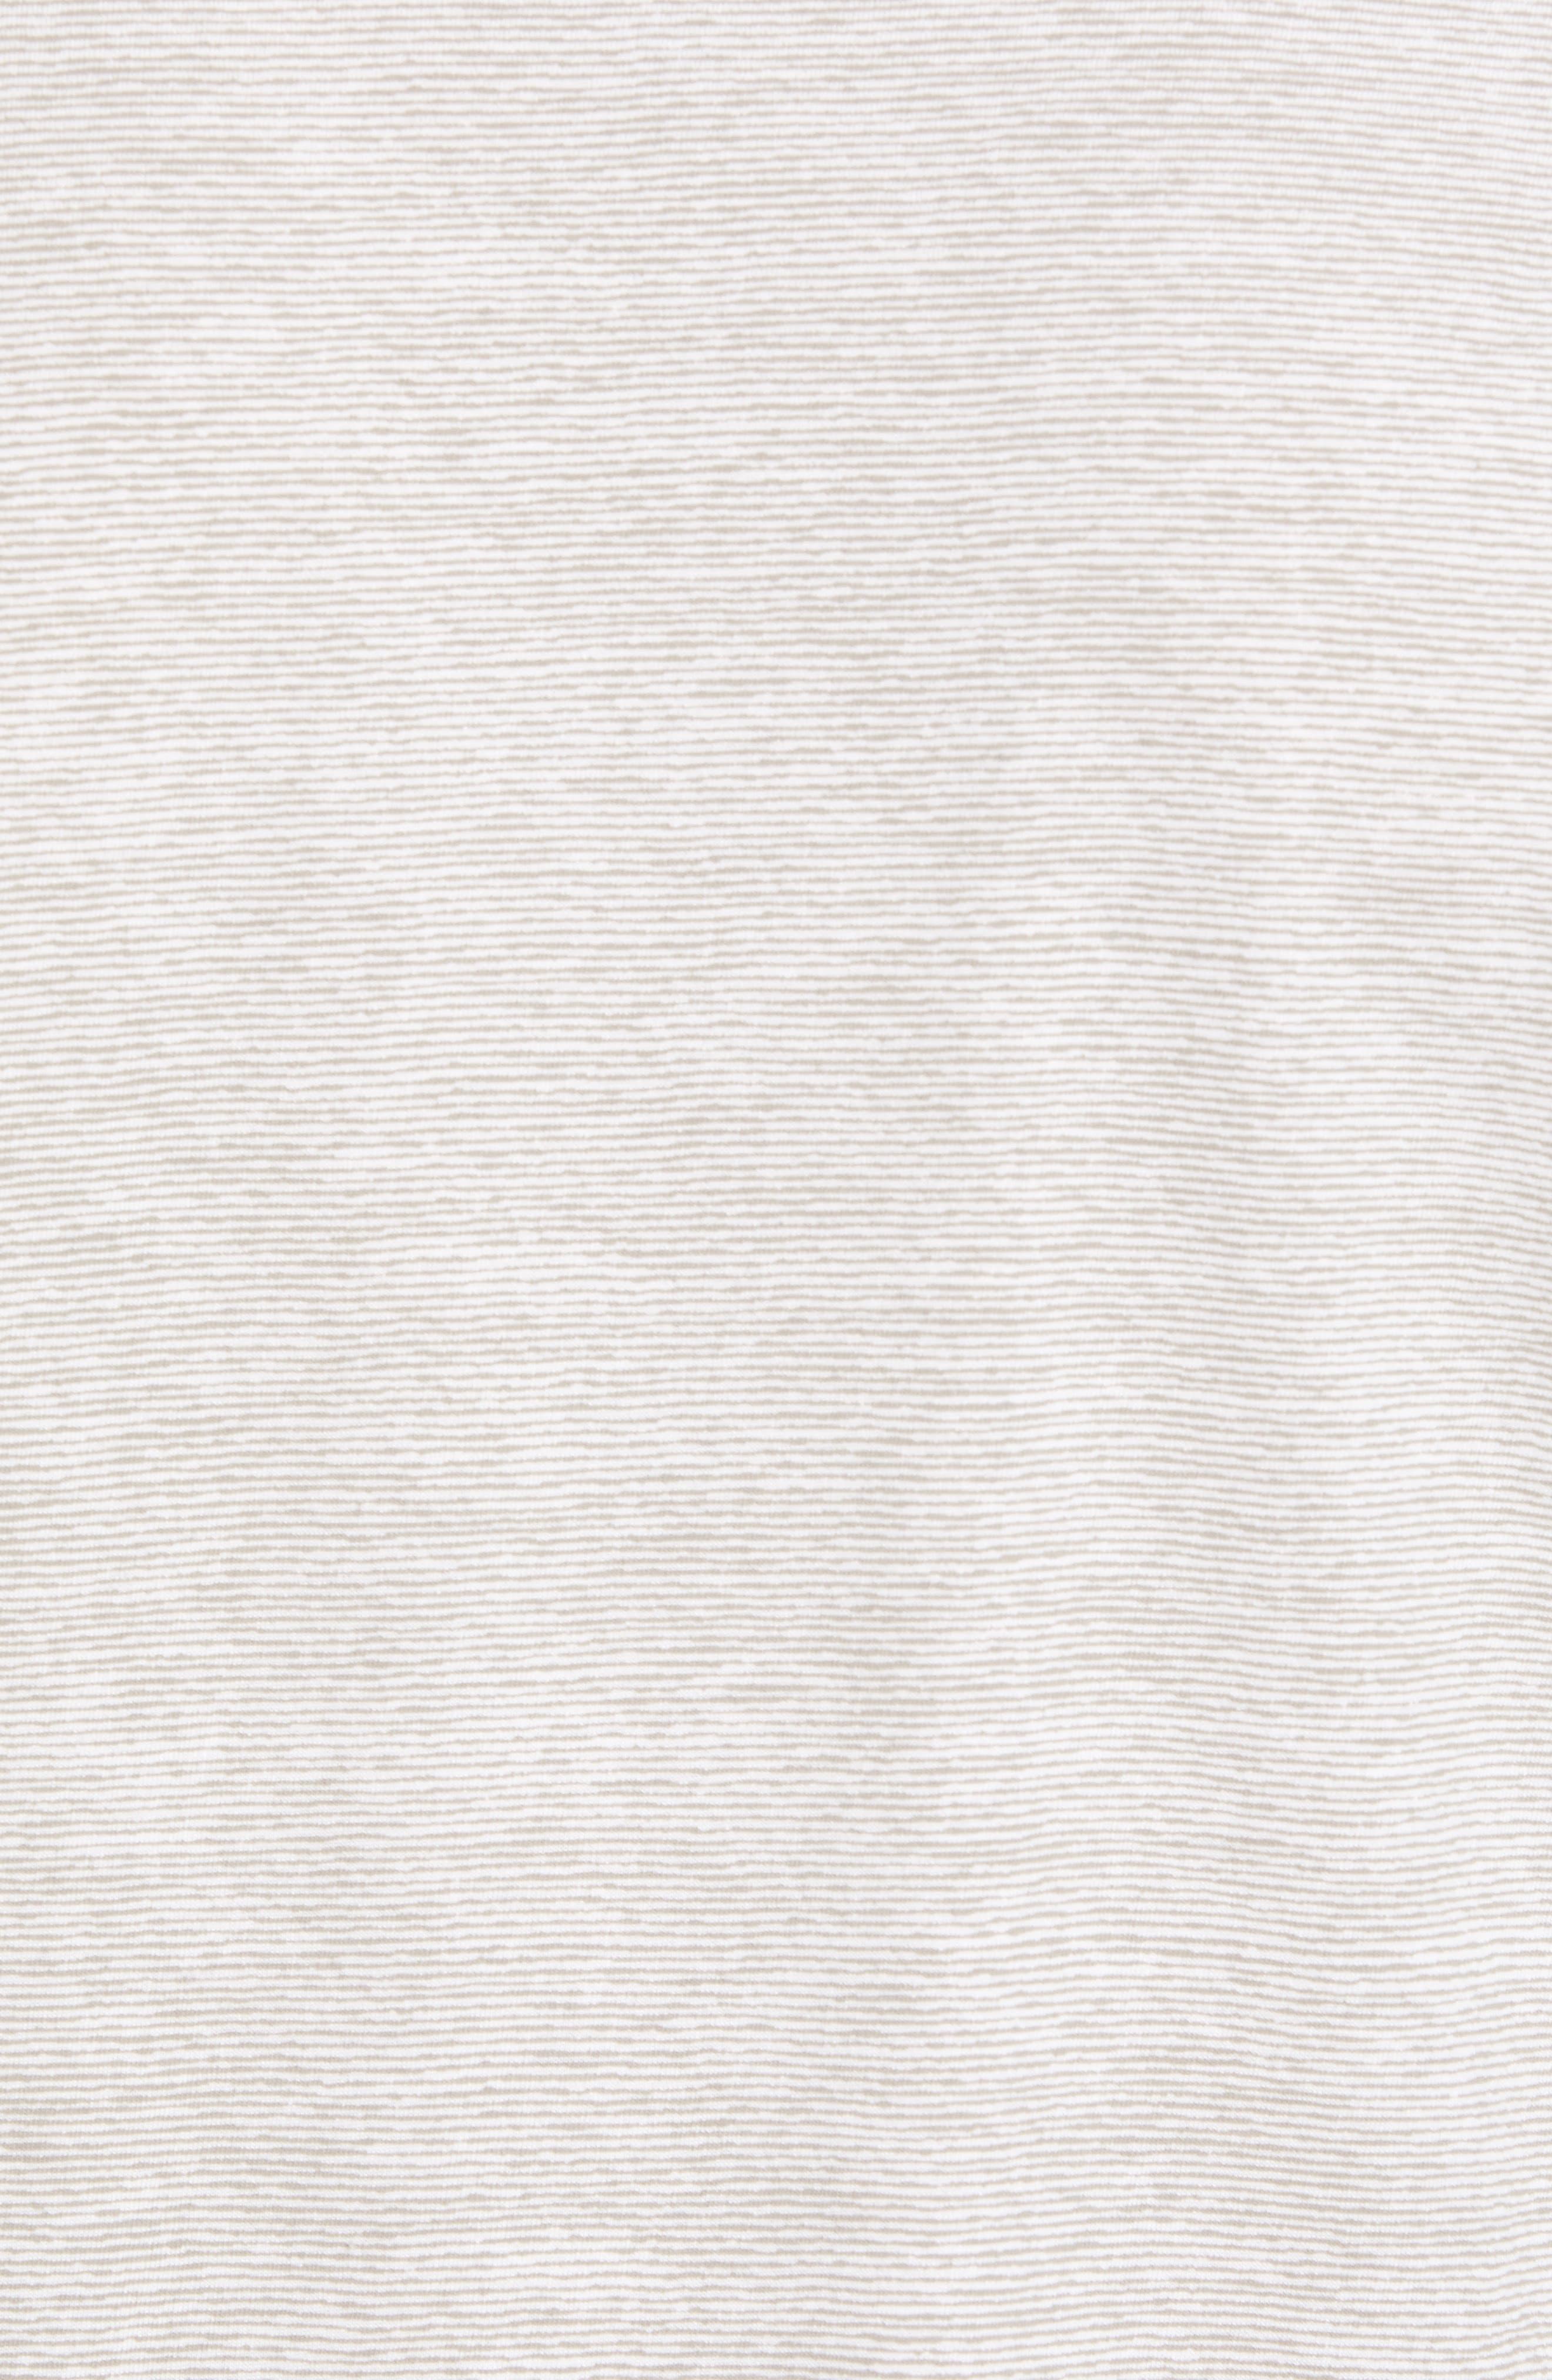 Essential Regular Fit Short Short Sleeve Henley,                             Alternate thumbnail 5, color,                             021